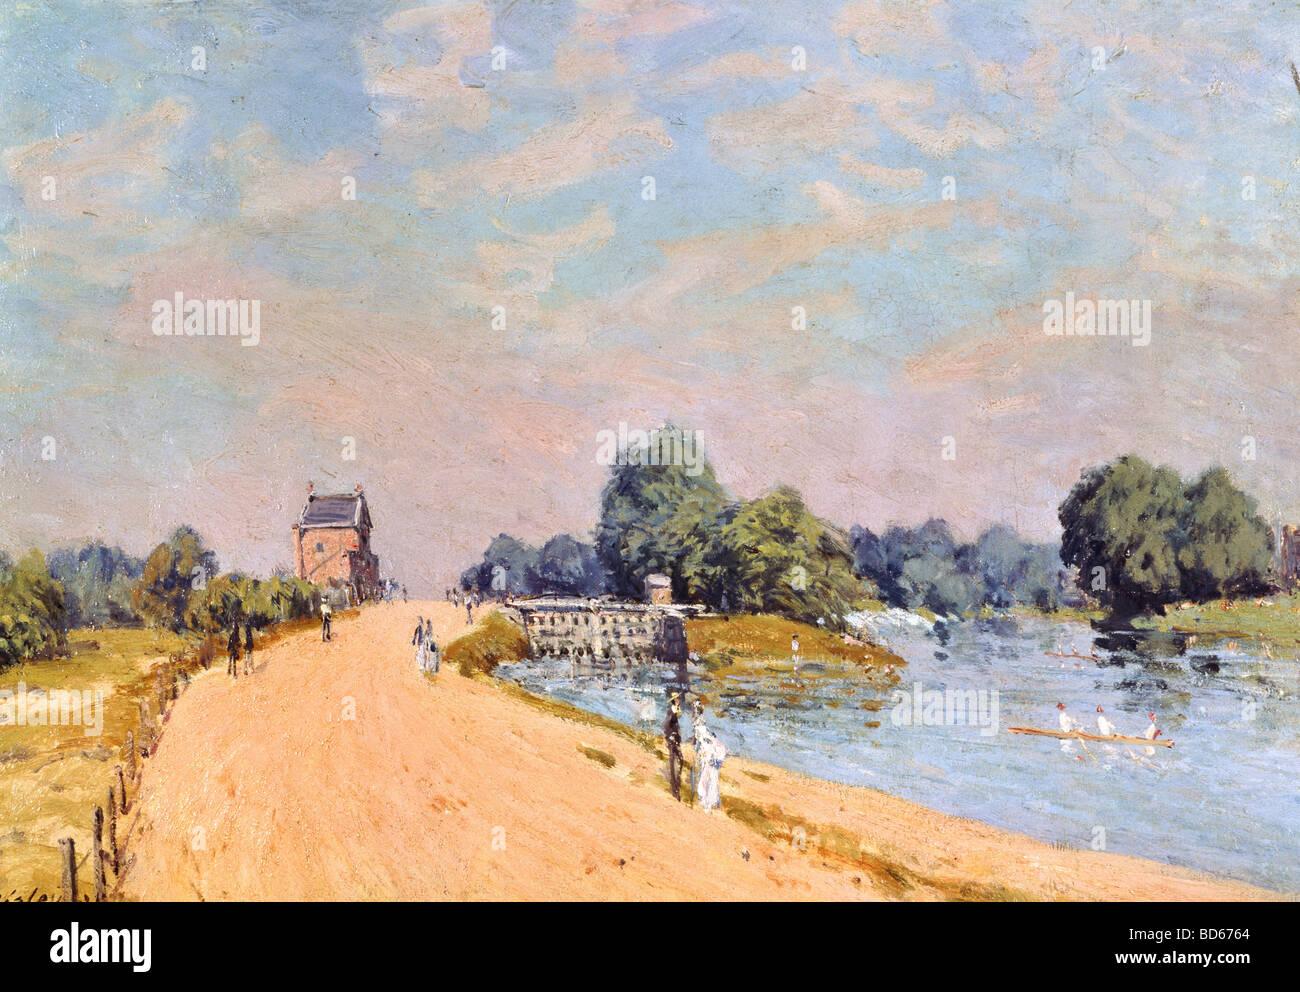 "Bildende Kunst, Sisley, Alfred, (1839-1899), Malerei, ""Die Straße in Hampton"", 1874, Öl auf Stockbild"